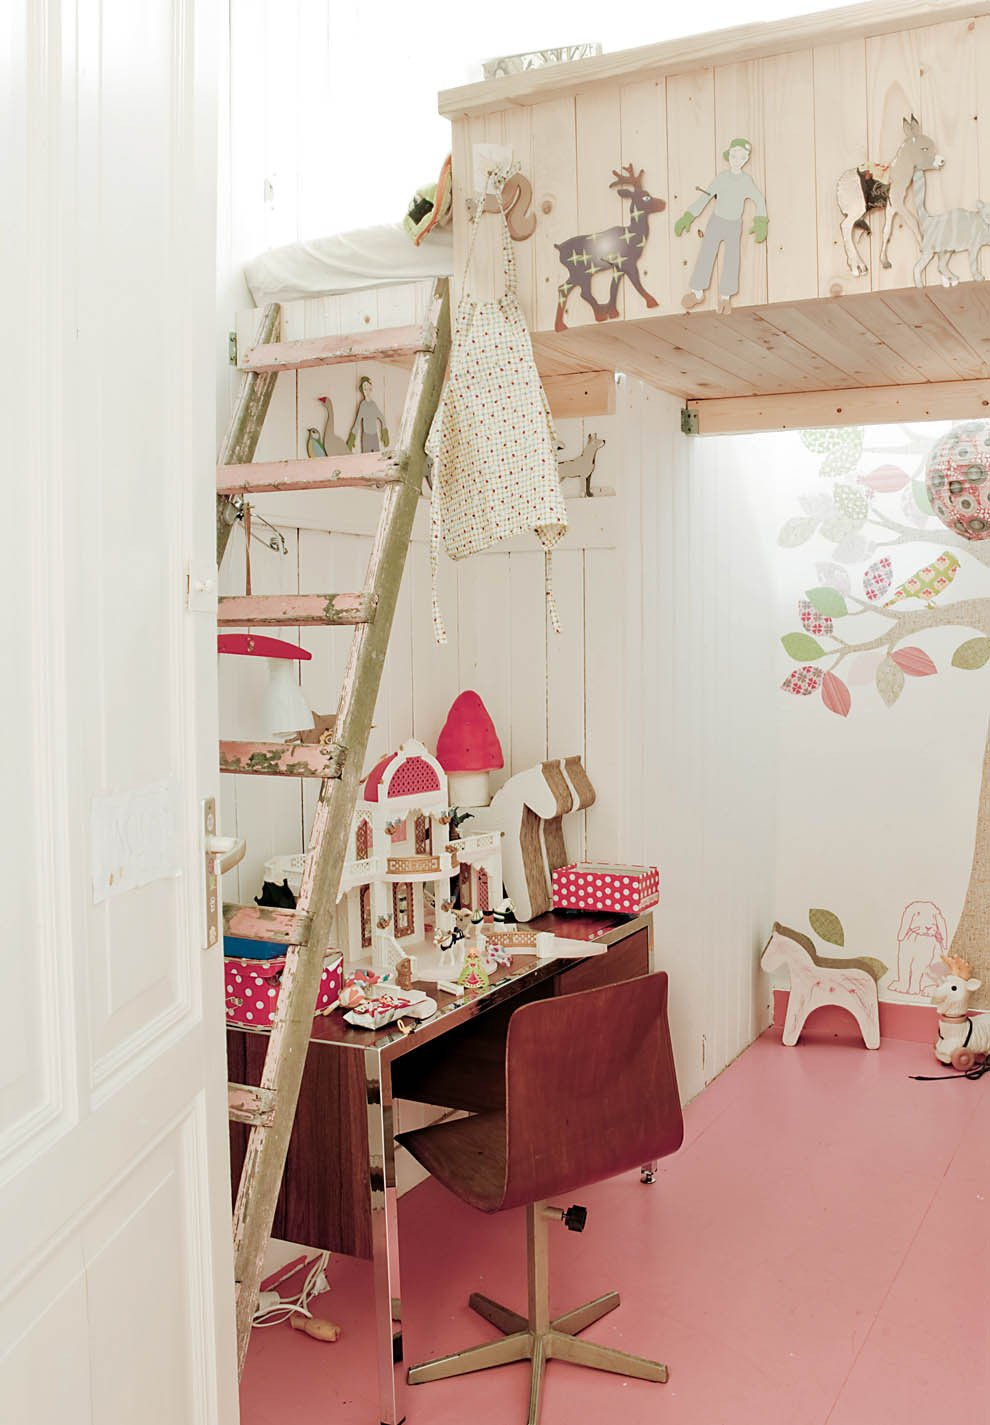 Room Decor Ideas for Girls Best Of 33 Wonderful Girls Room Design Ideas